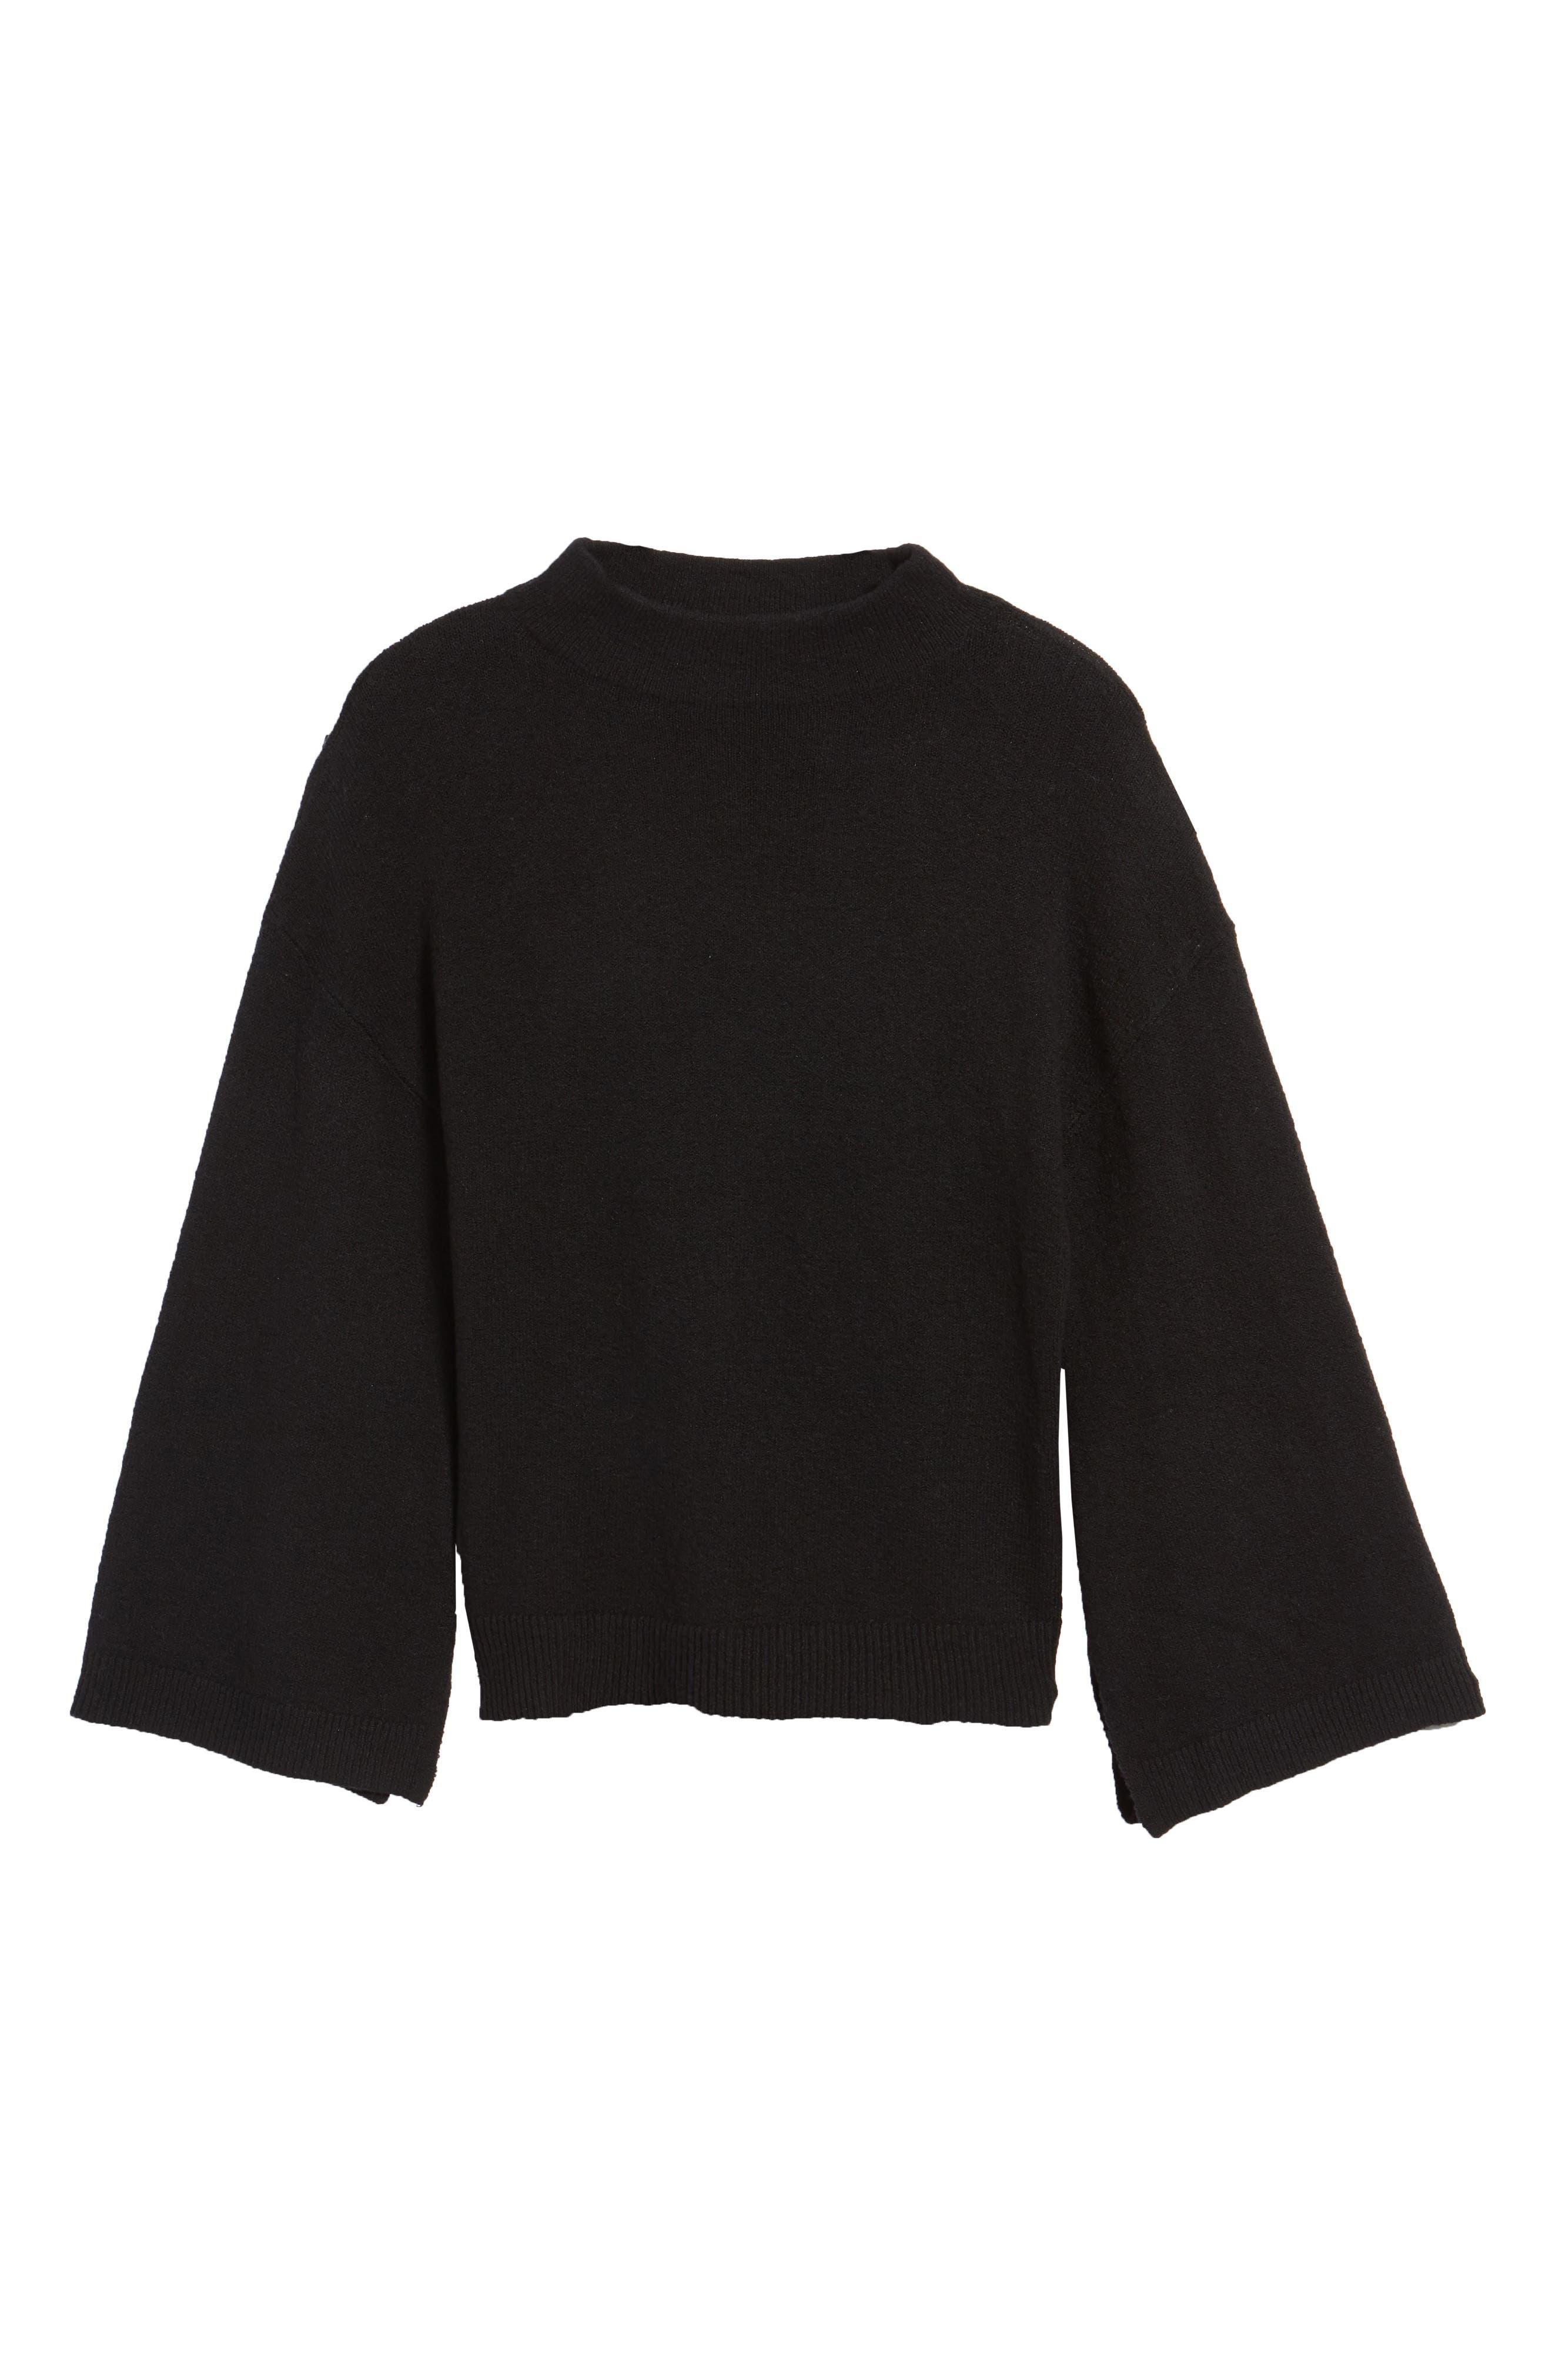 Dolman Sleeve Sweater,                             Alternate thumbnail 21, color,